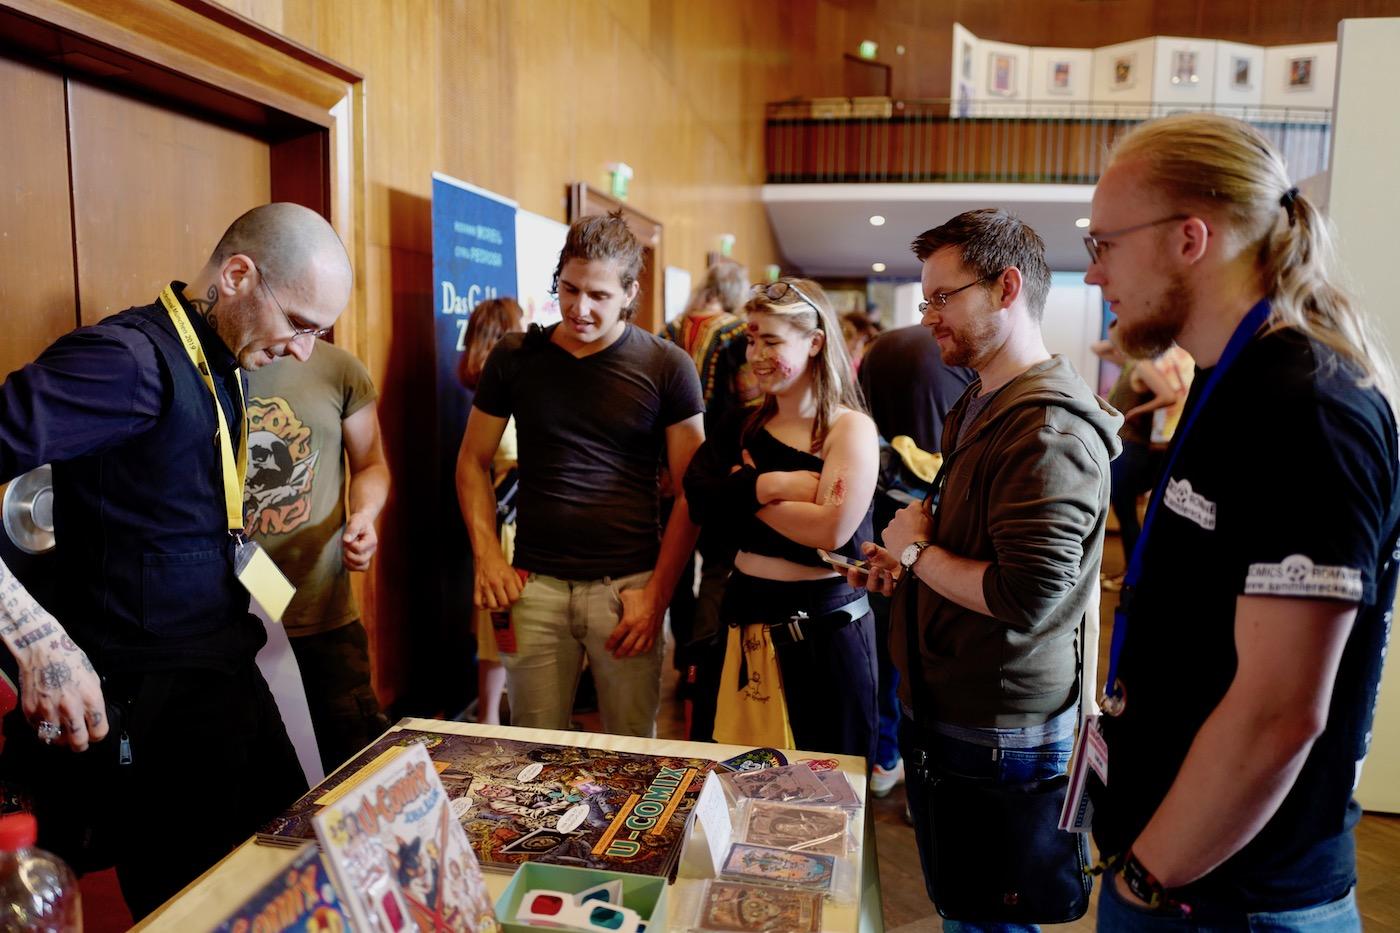 mark_benecke_comic_festival_muenchen_munich_comic_con_2019 - 21.jpg